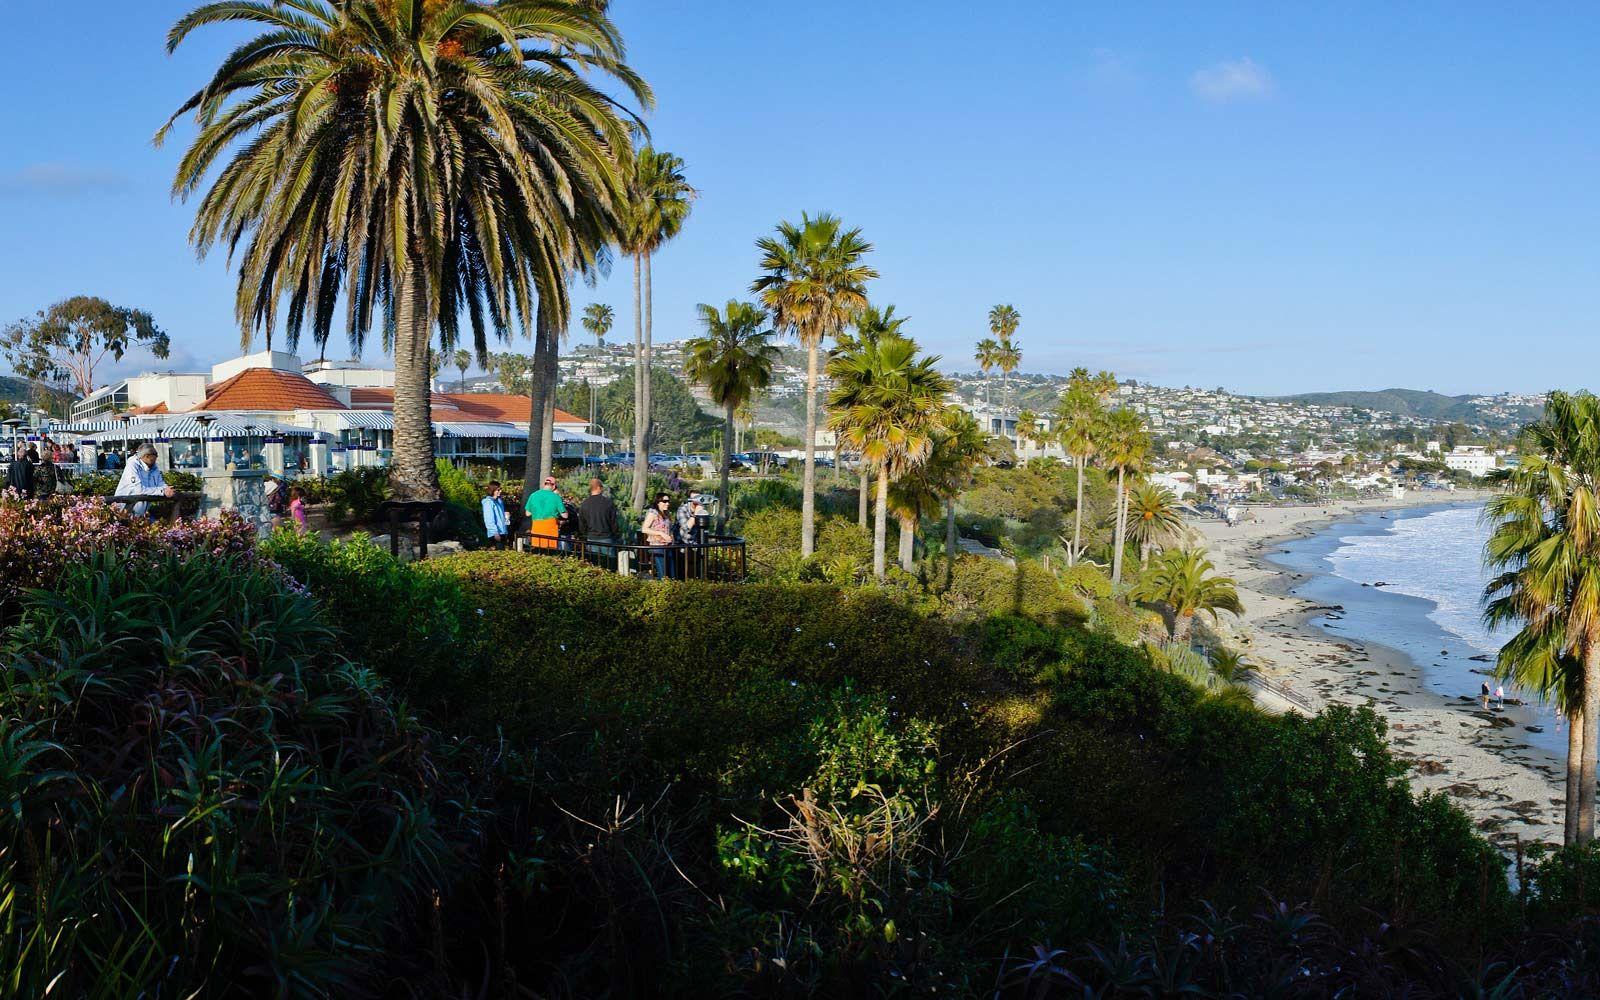 Las Brisas Restaurant Laguna Beach Restaurants Laguna Beach California Travel